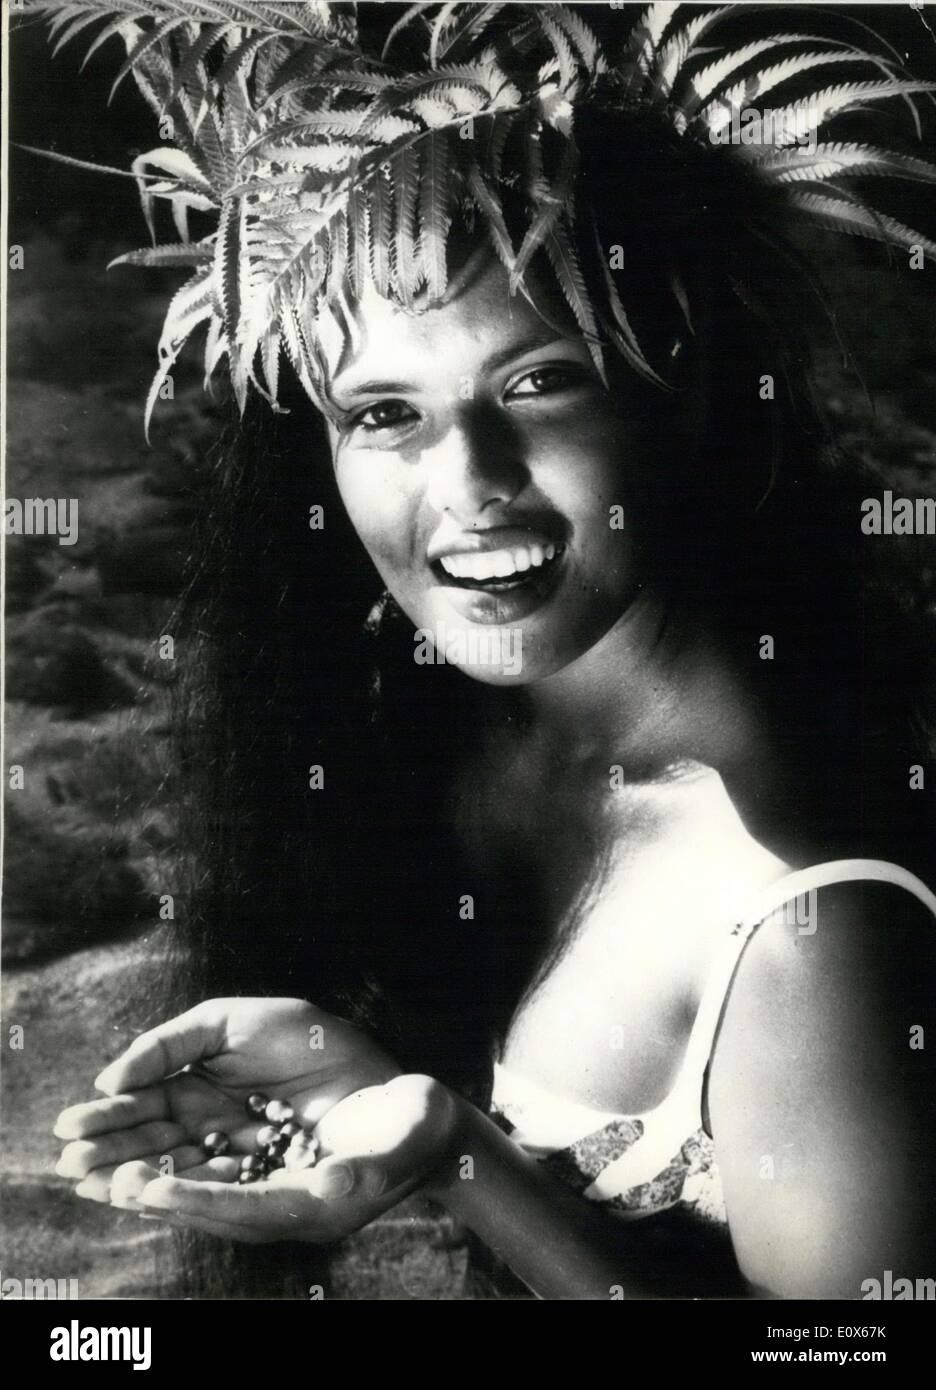 Jun. 22, 1965 - Tahitian Woman Holds Black, White, Pink Bora Bora Pearls - Stock Image